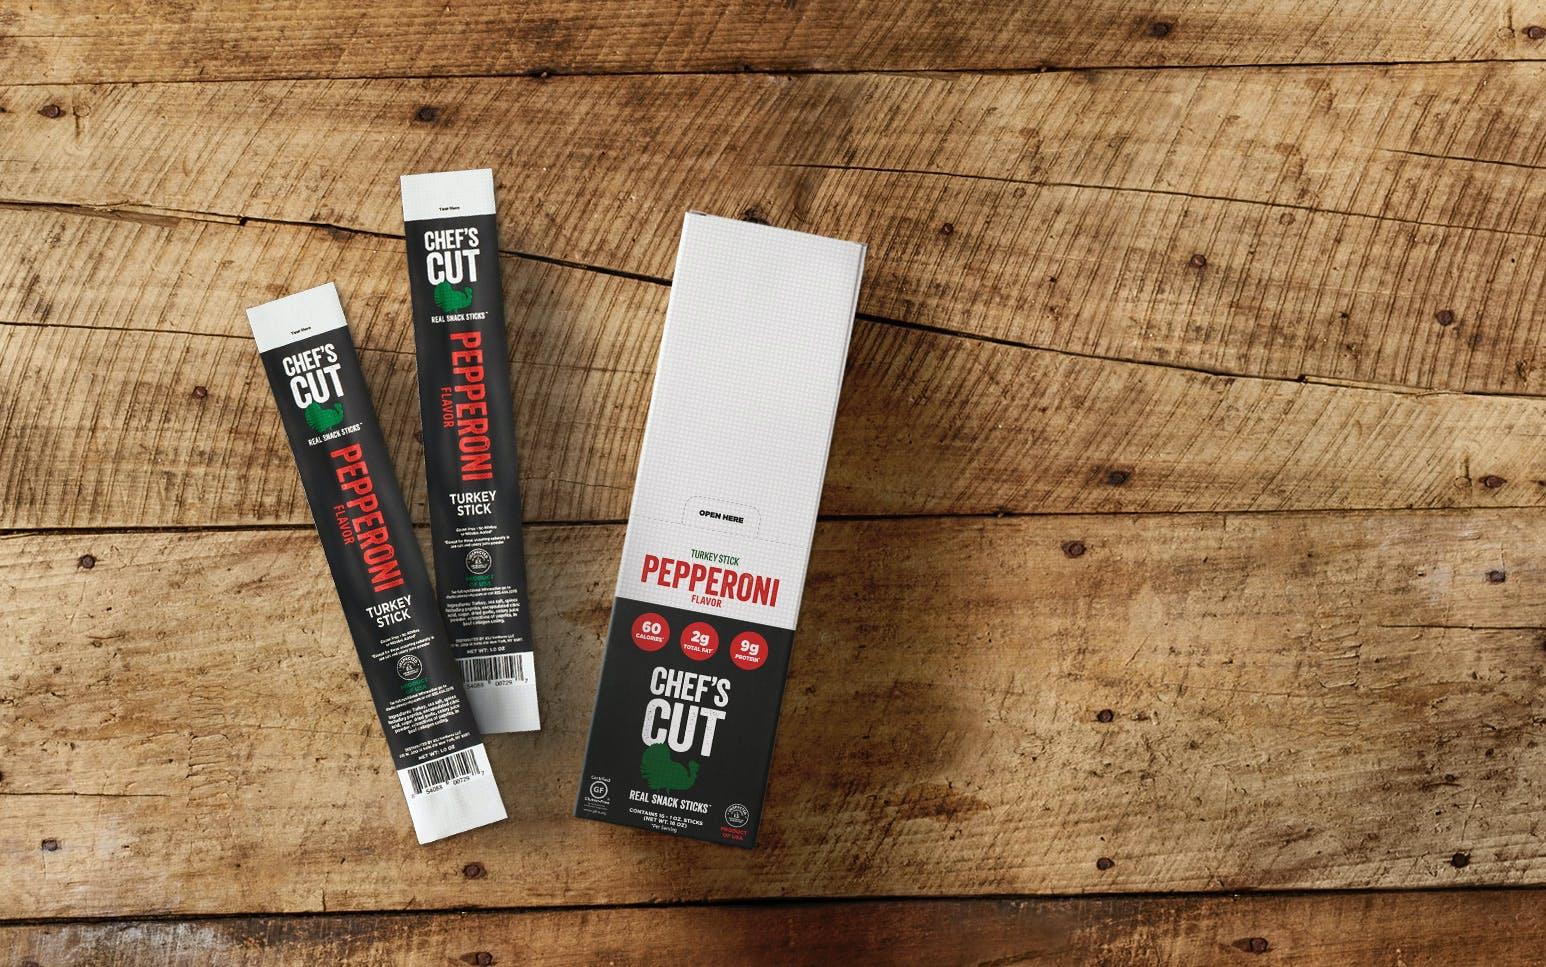 Chef's Cut Premium Turkey Pepperoni Sticks